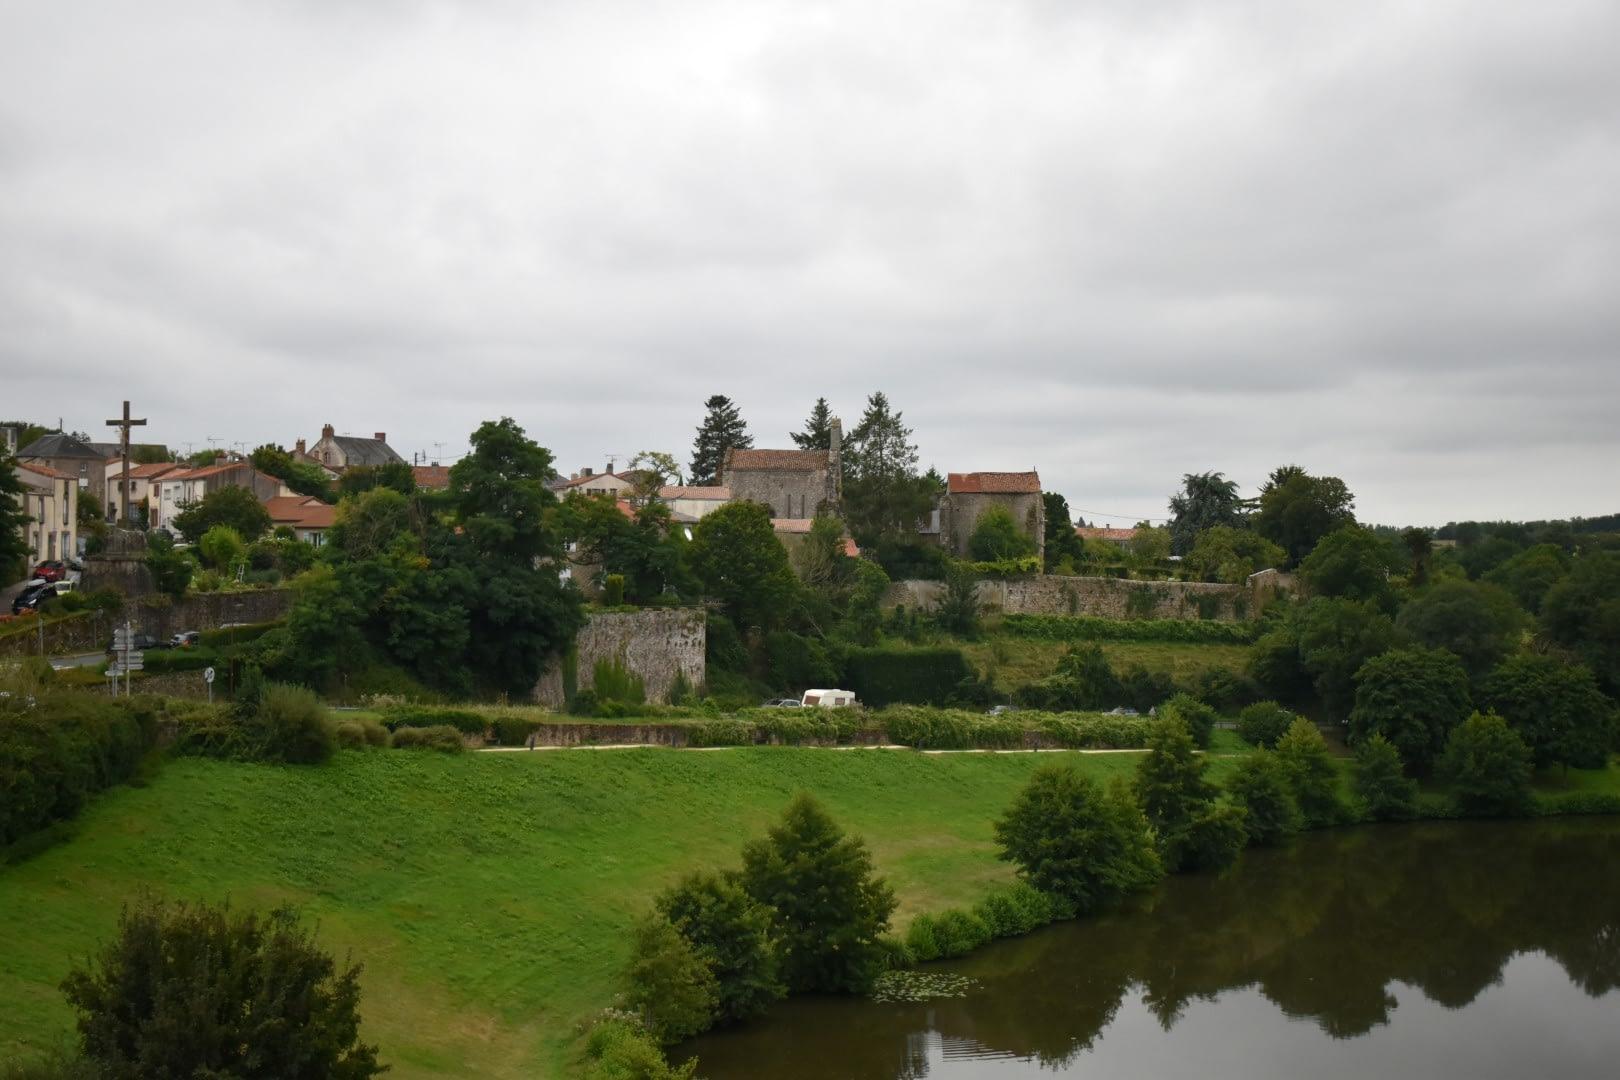 Town of Tiffauges and around, Vendée